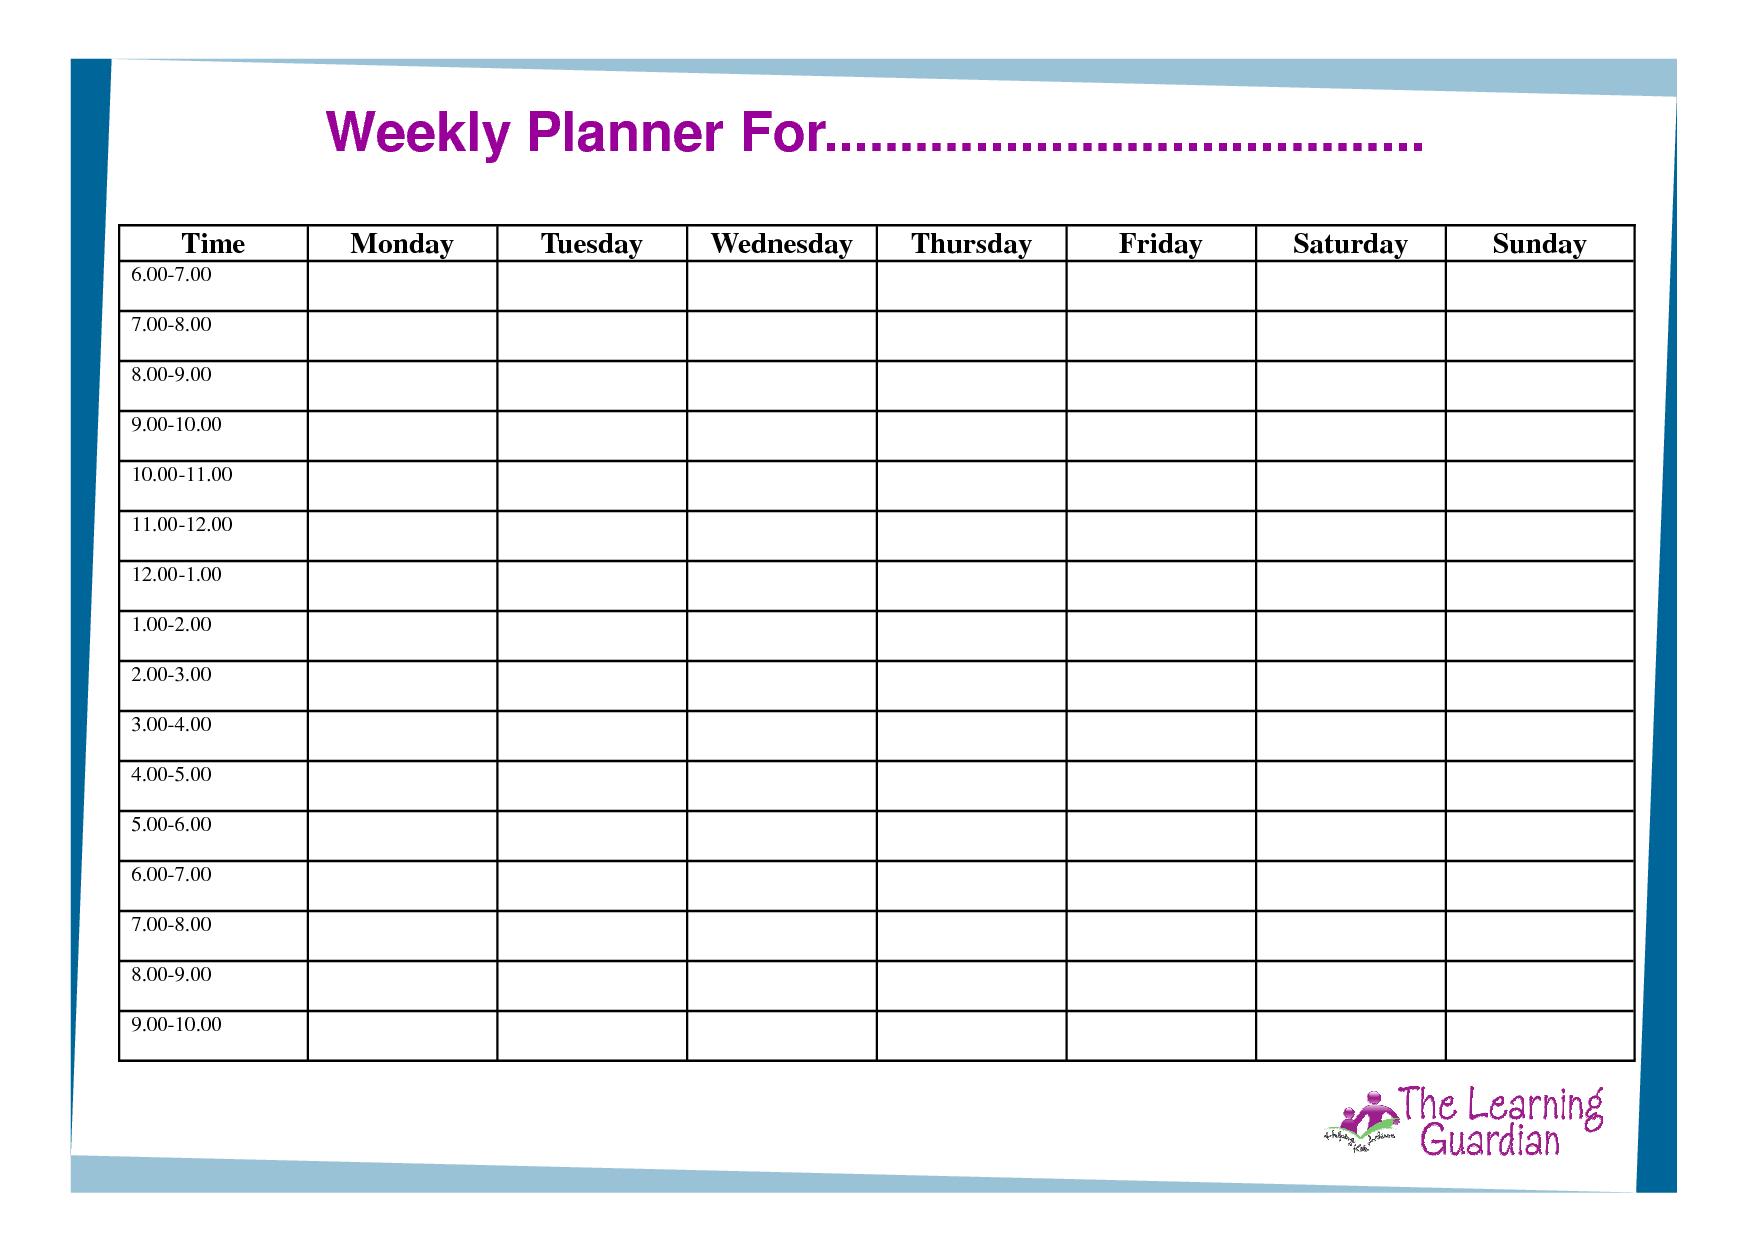 Free Printable Weekly Calendar Templates | Weekly Planner For Time - Free Printable Blank Weekly Schedule